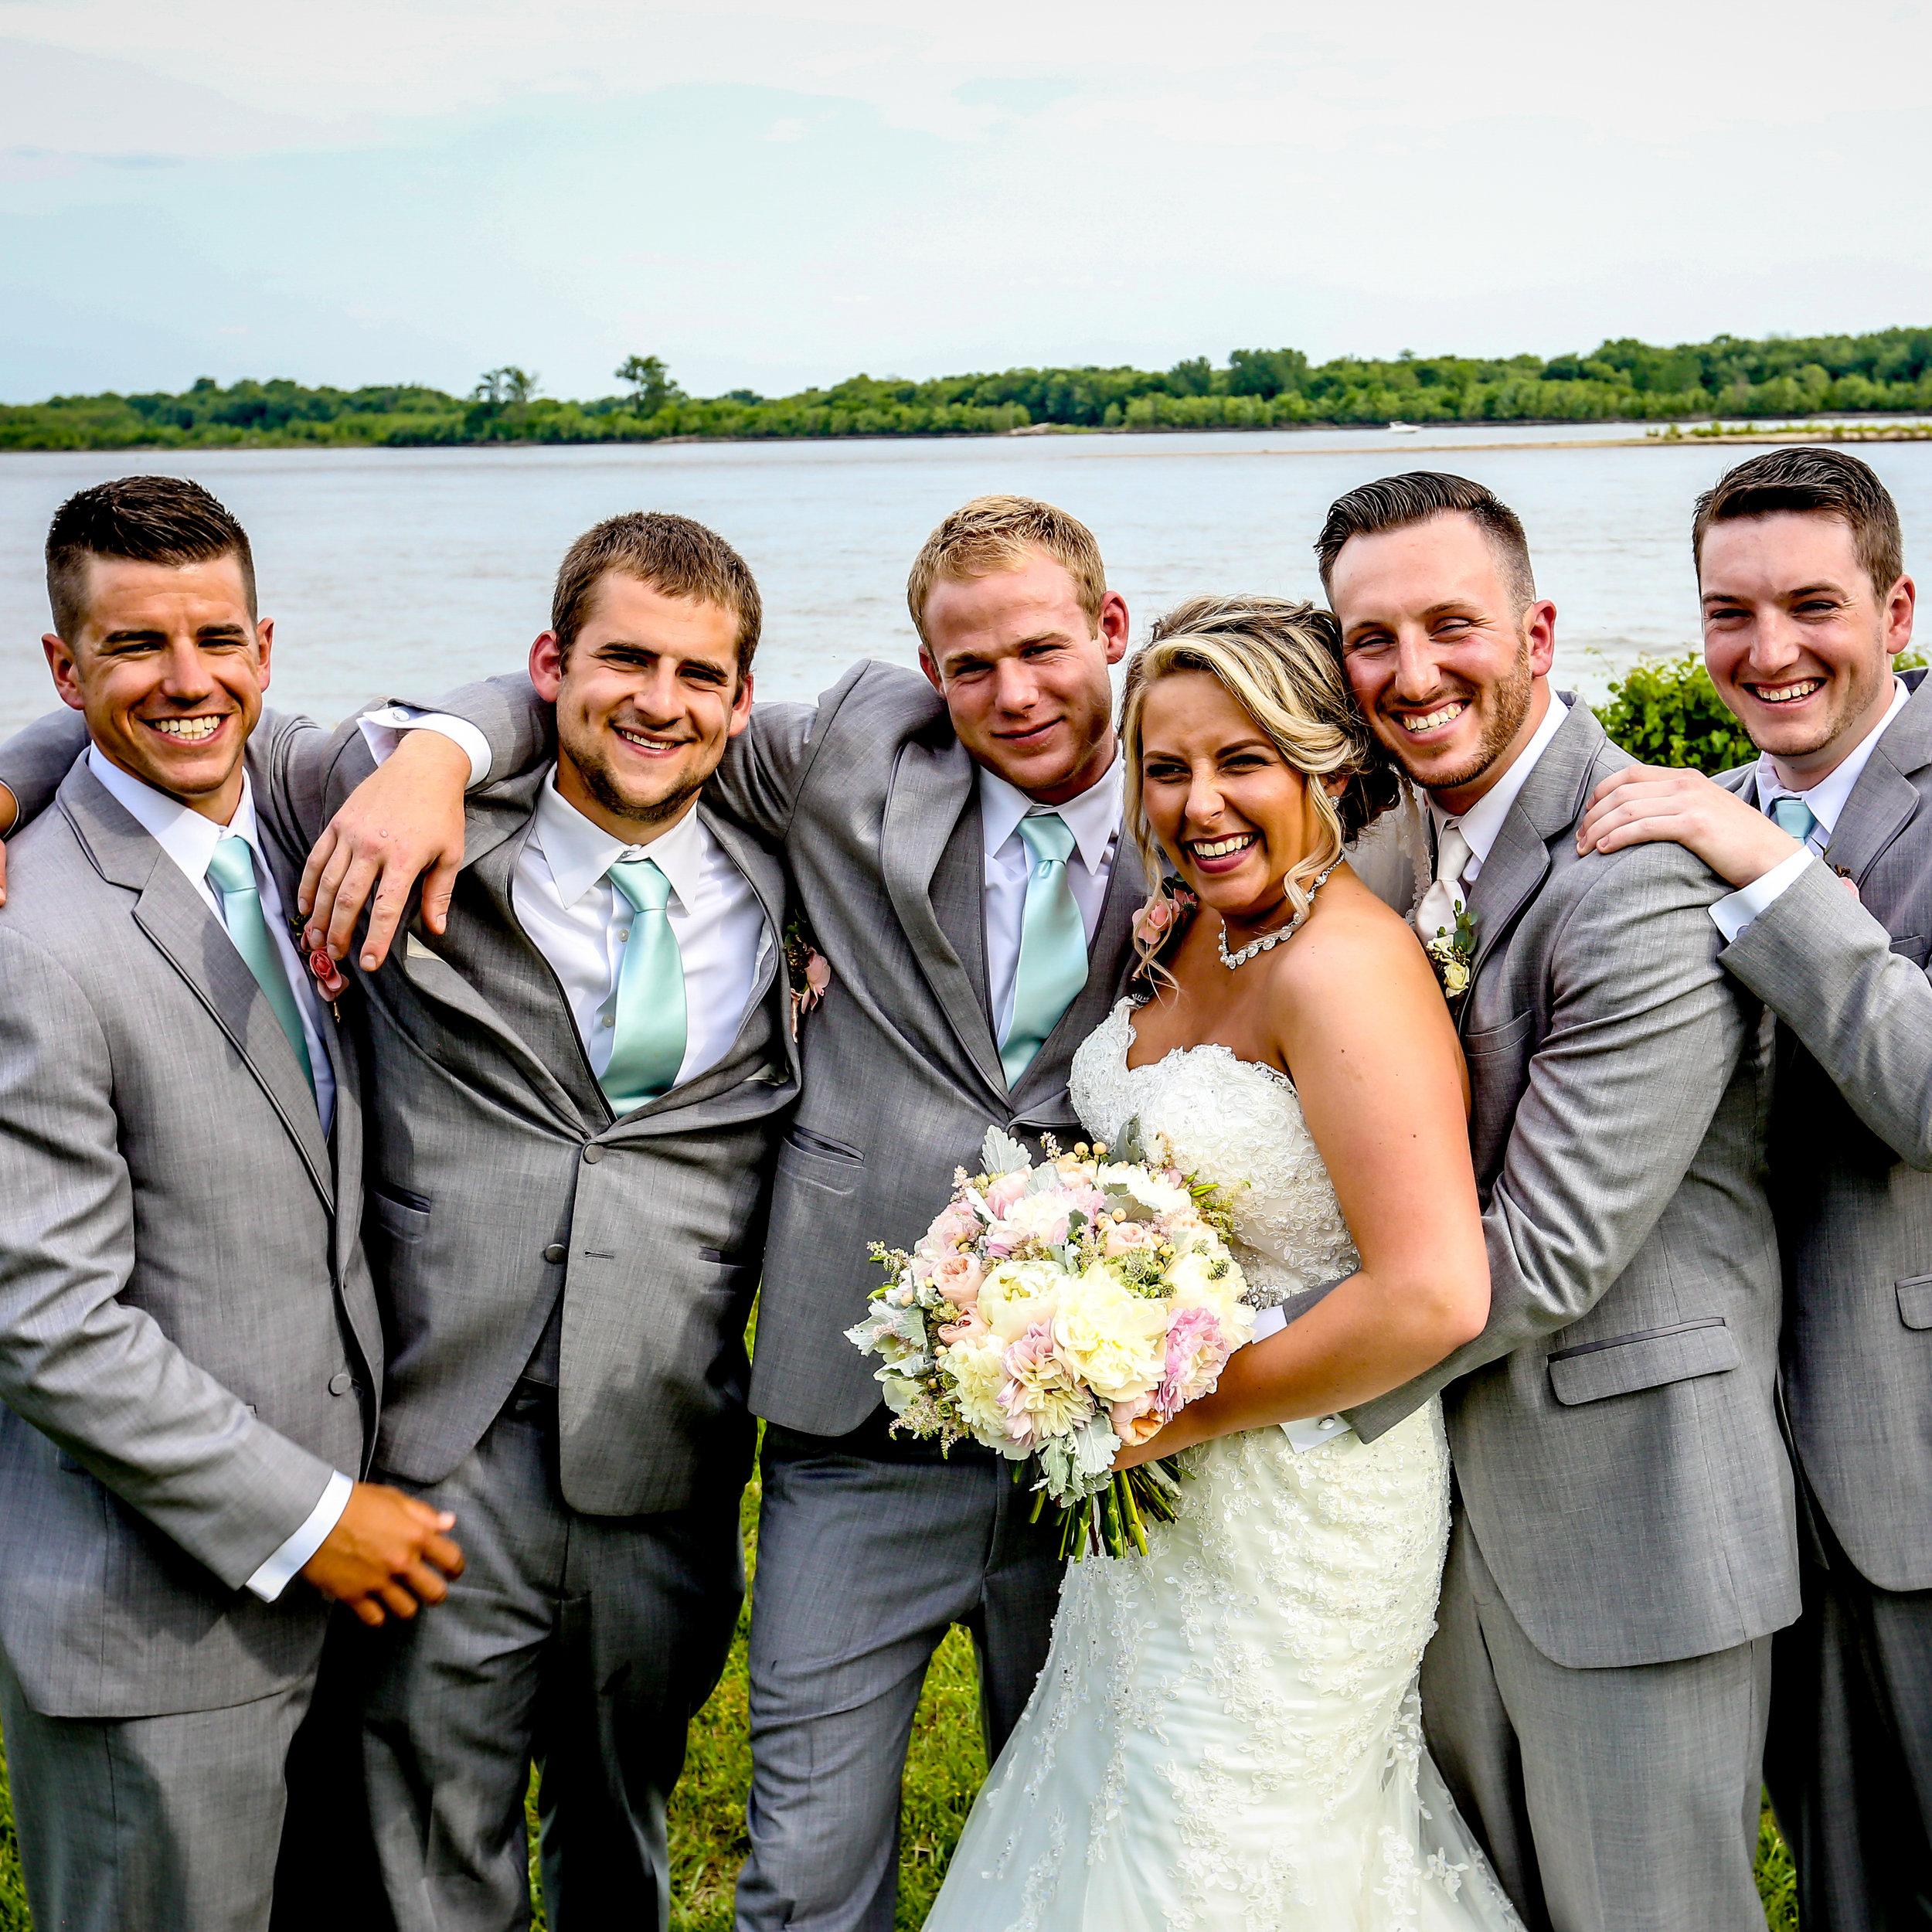 WeddingWebsite-24.jpg